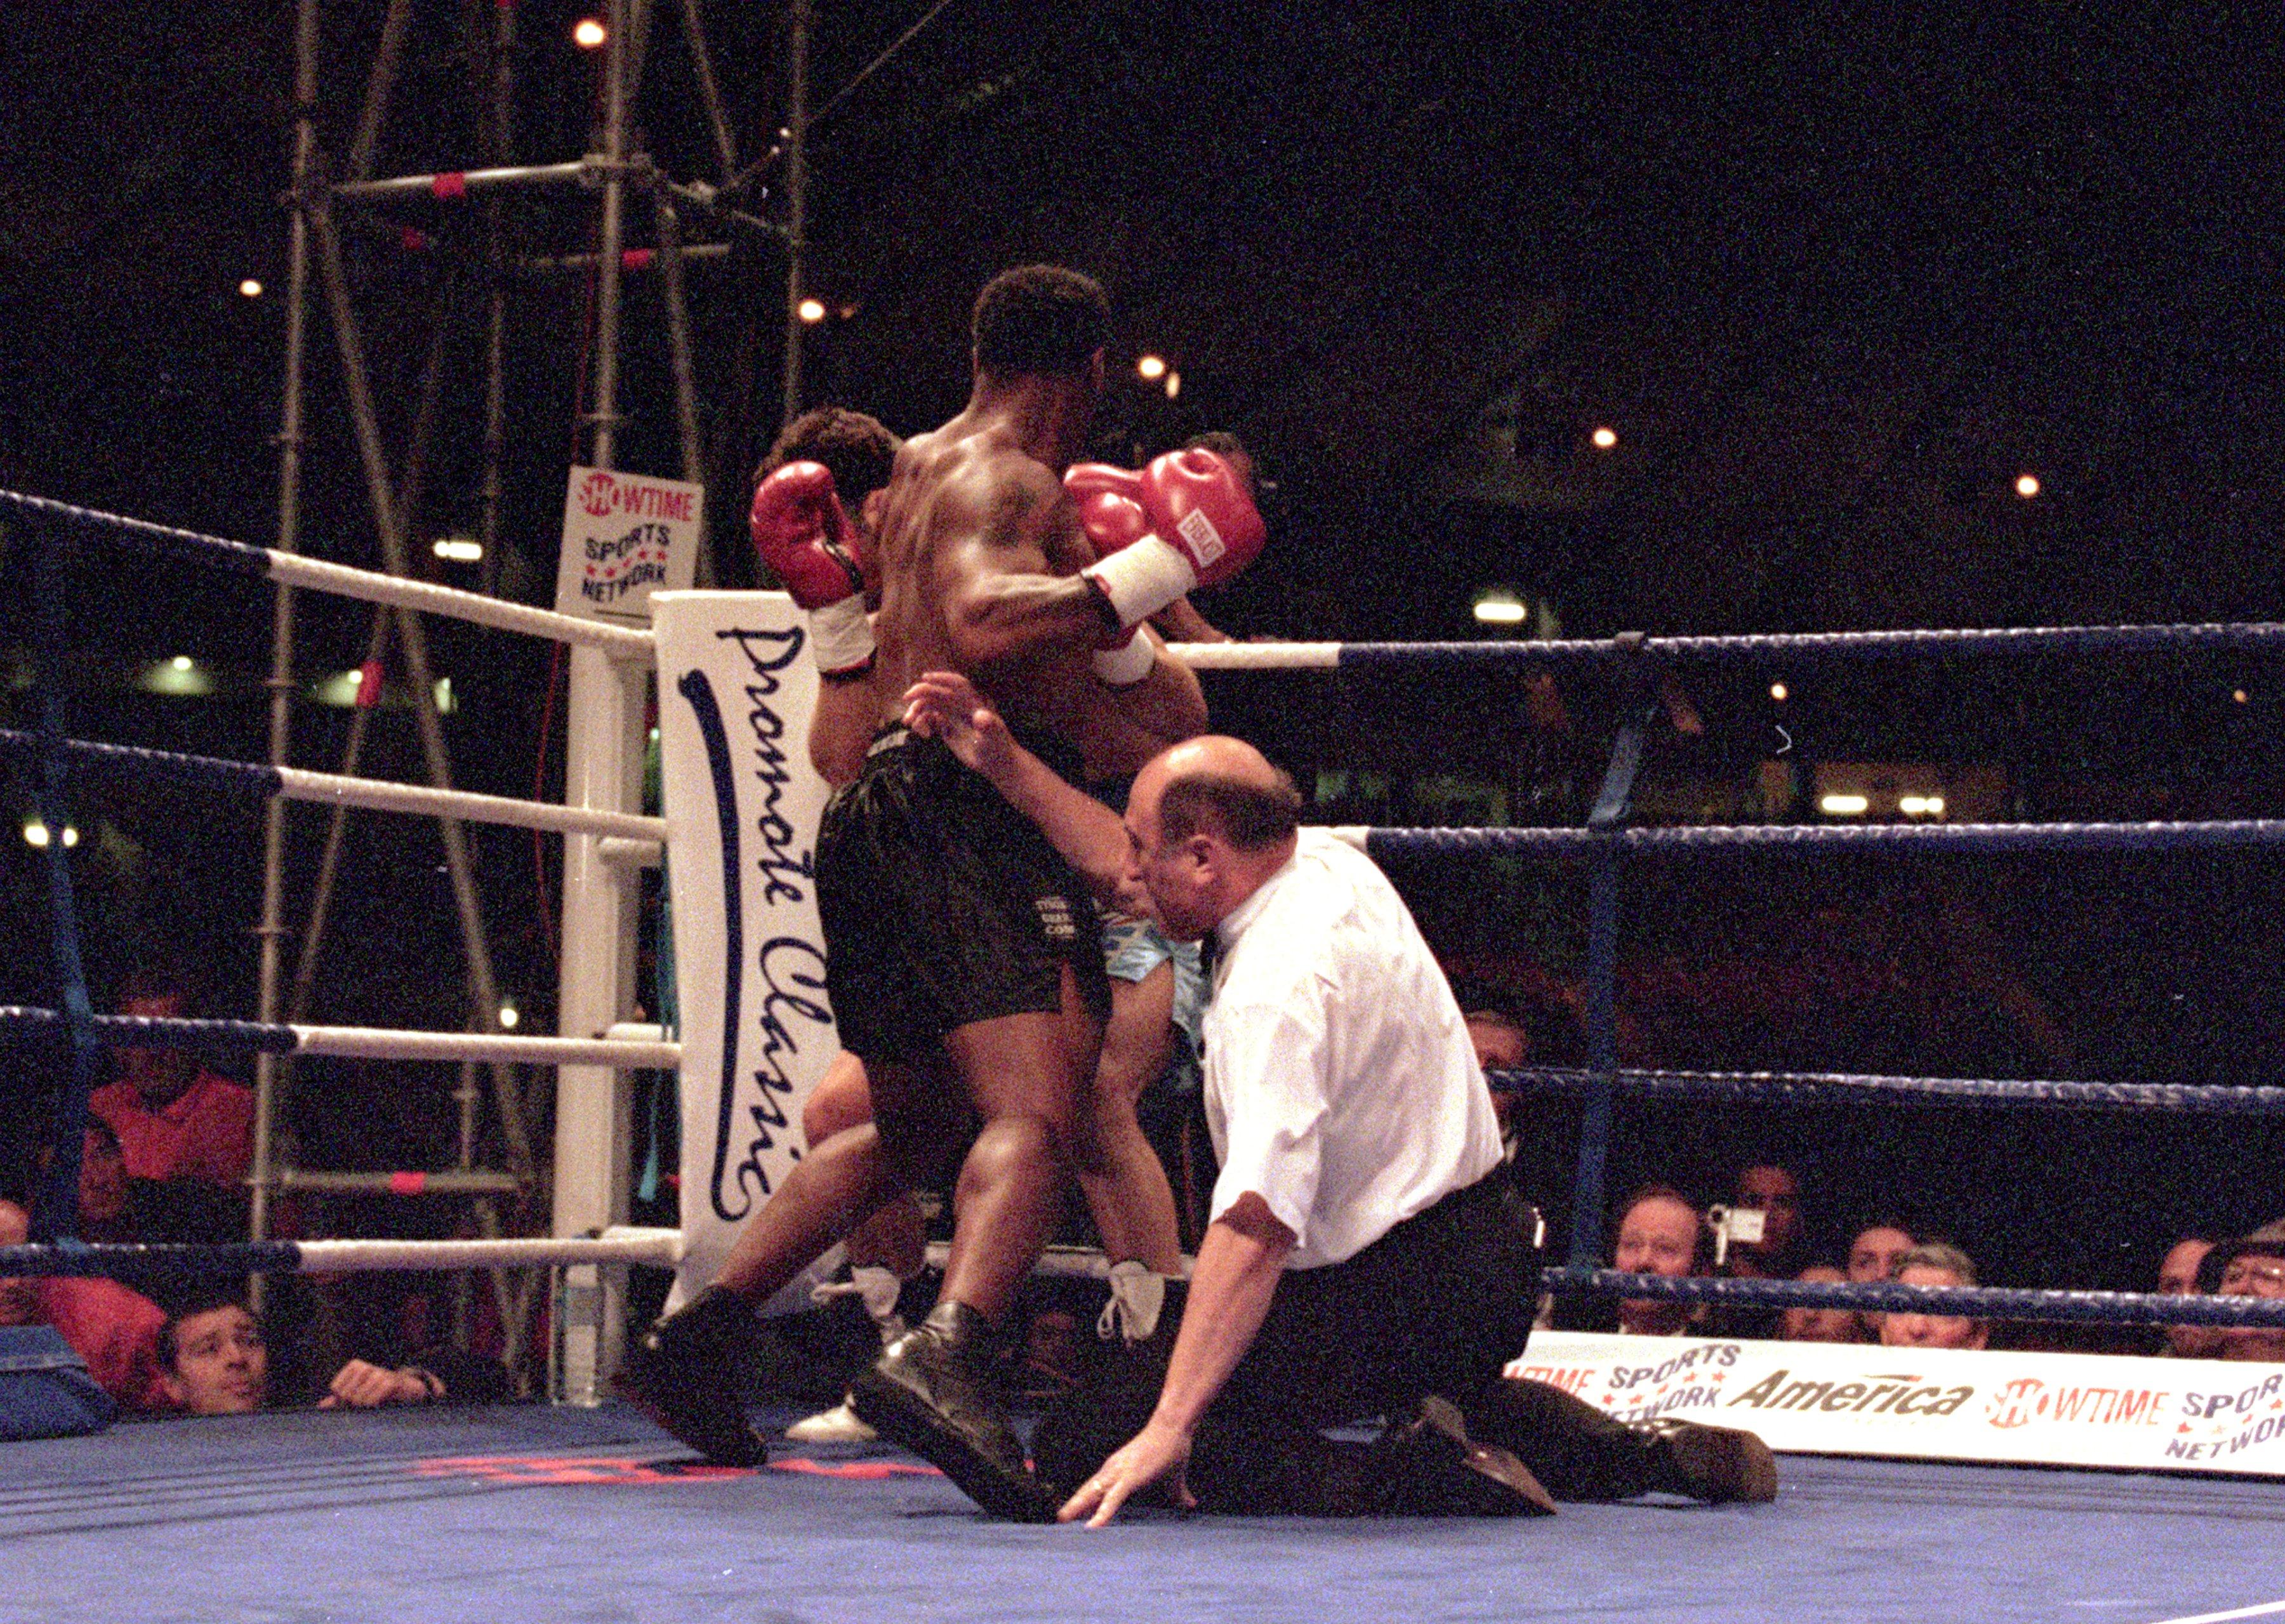 24 Jun 2000:  Mike Tyson floors the referee during the heavyweight fight against Lou Savarese at Hampden Park in Glasgow, Scotland.  Mike Tyson won when the referee stopped the fight in the first round. \ Mandatory Credit: John Gichigi /Allsport